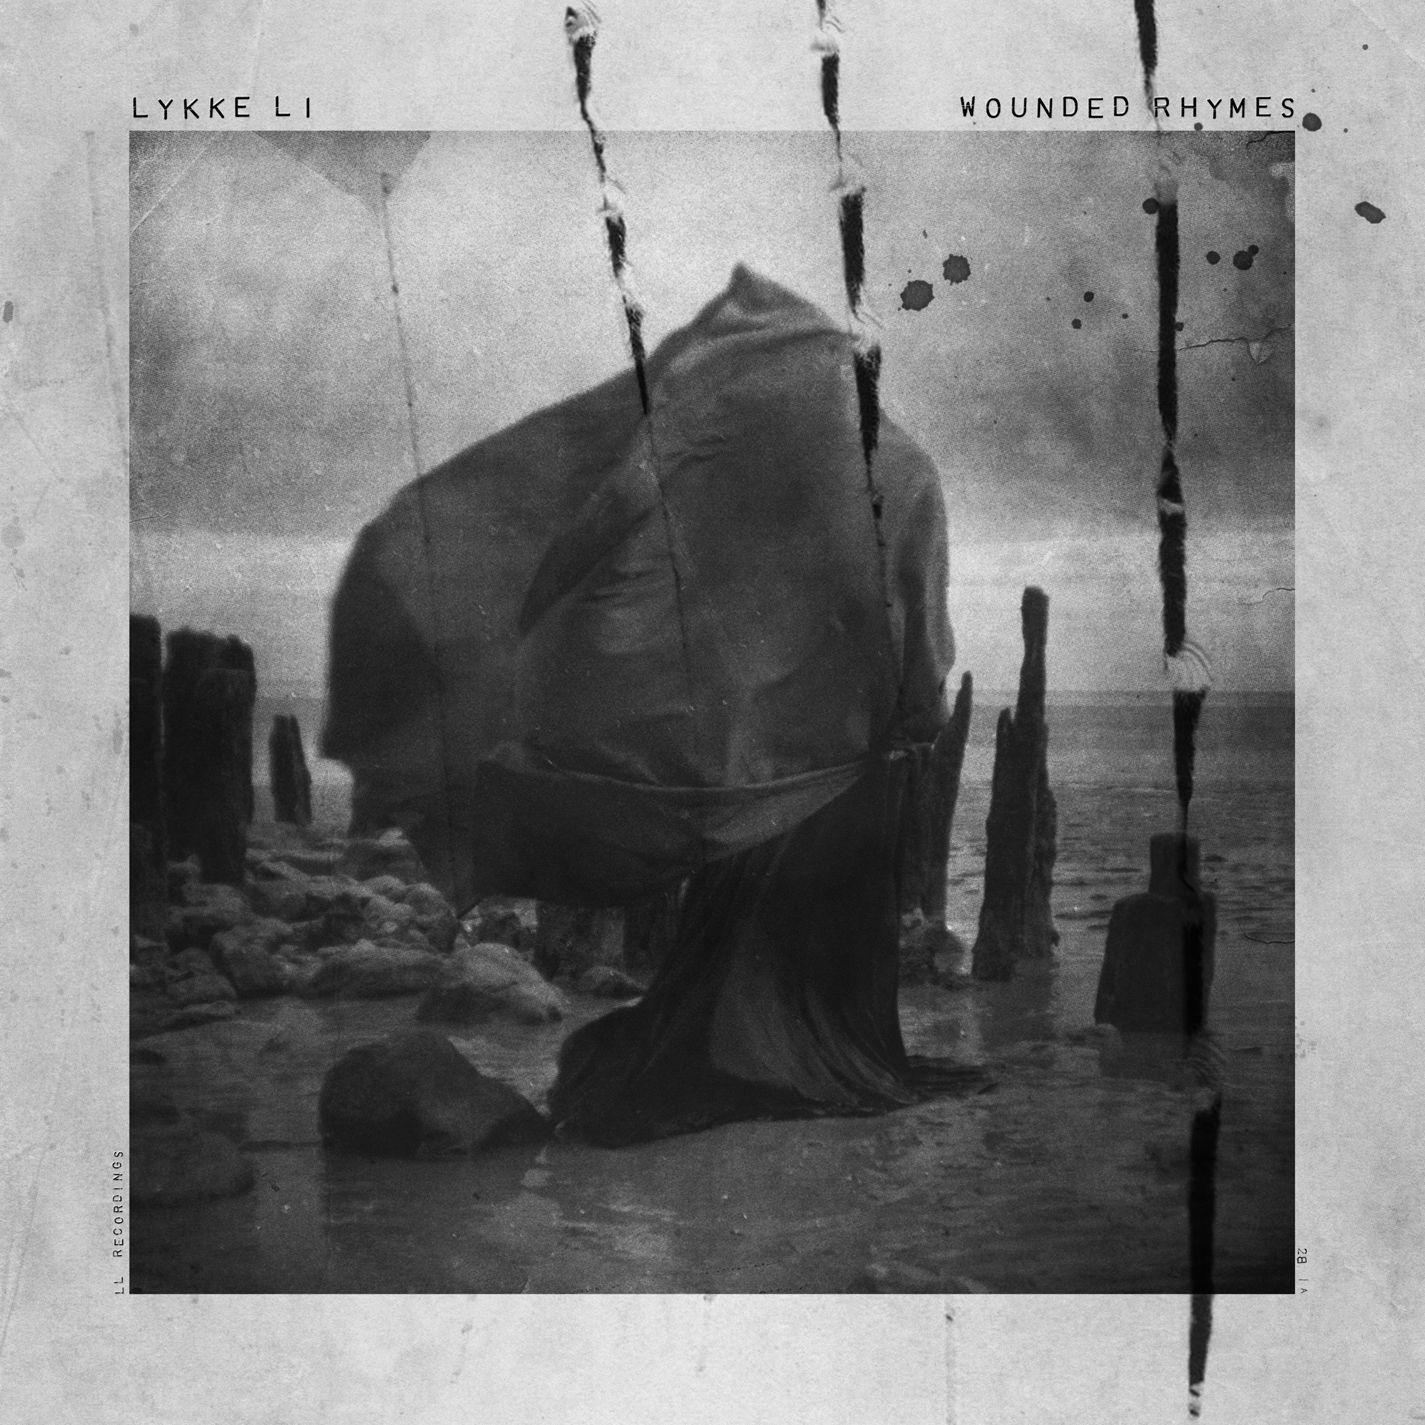 Lykke Li - Wounded Rhymes album cover